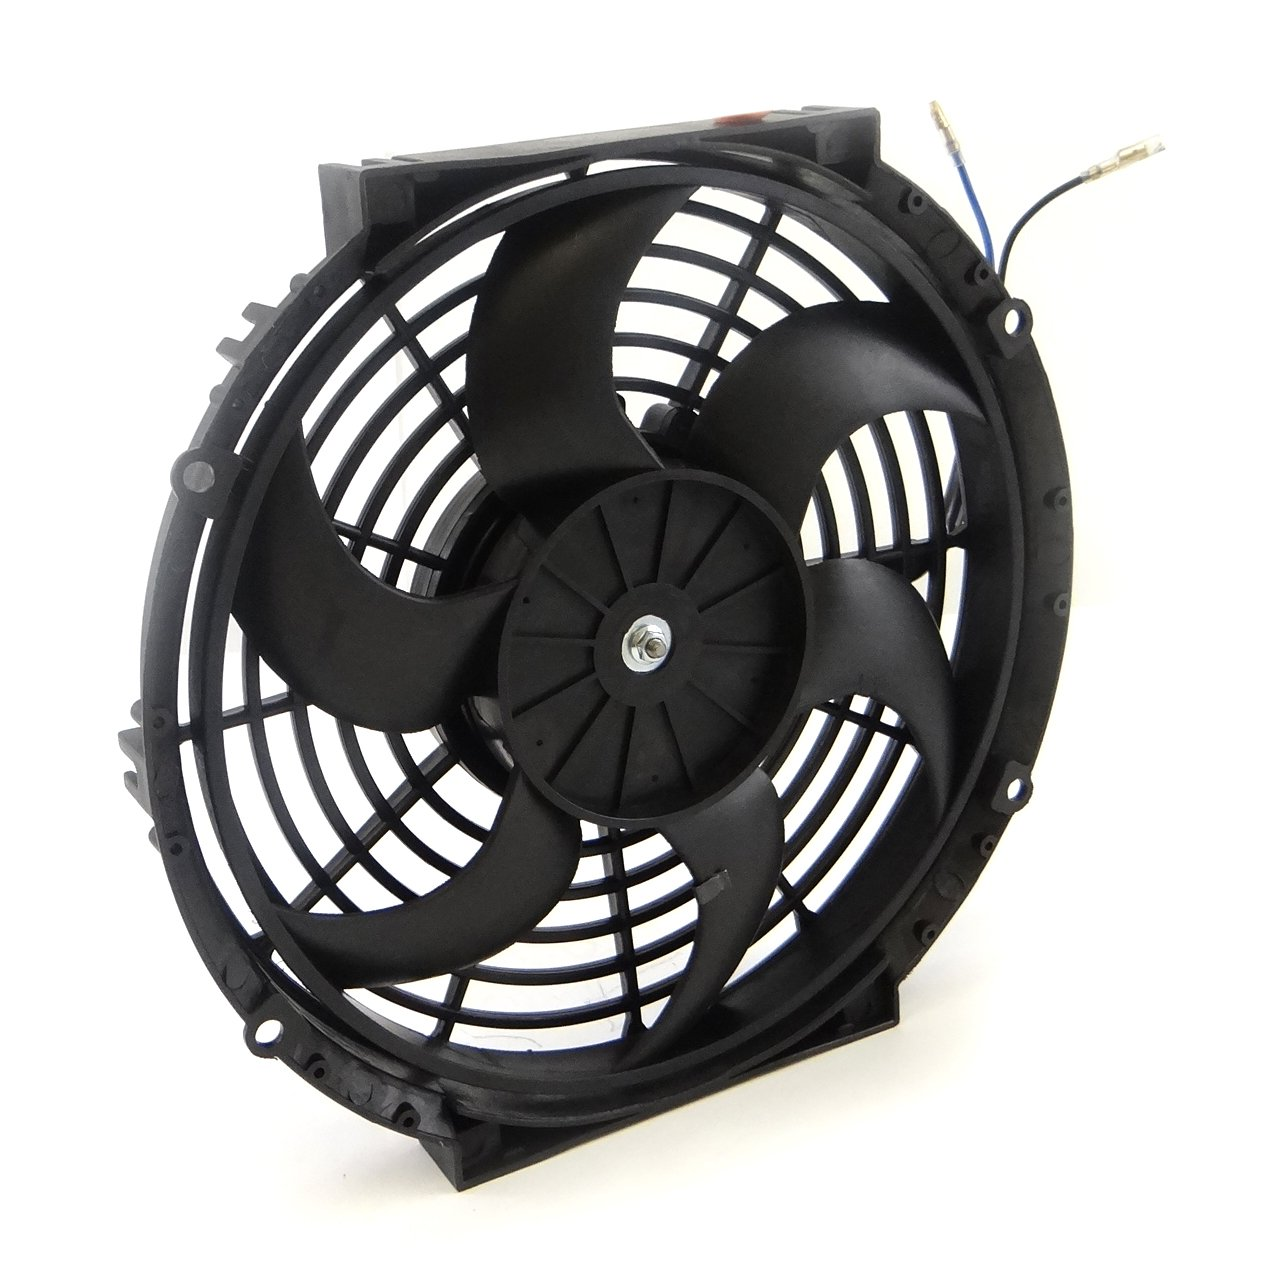 Set Of 2 Universal 10 Inch Slim Fan Push Pull Electric Flexalite Black Magic Series Coximportcom A Radiator Cooling 12v Mount Kit Automotive